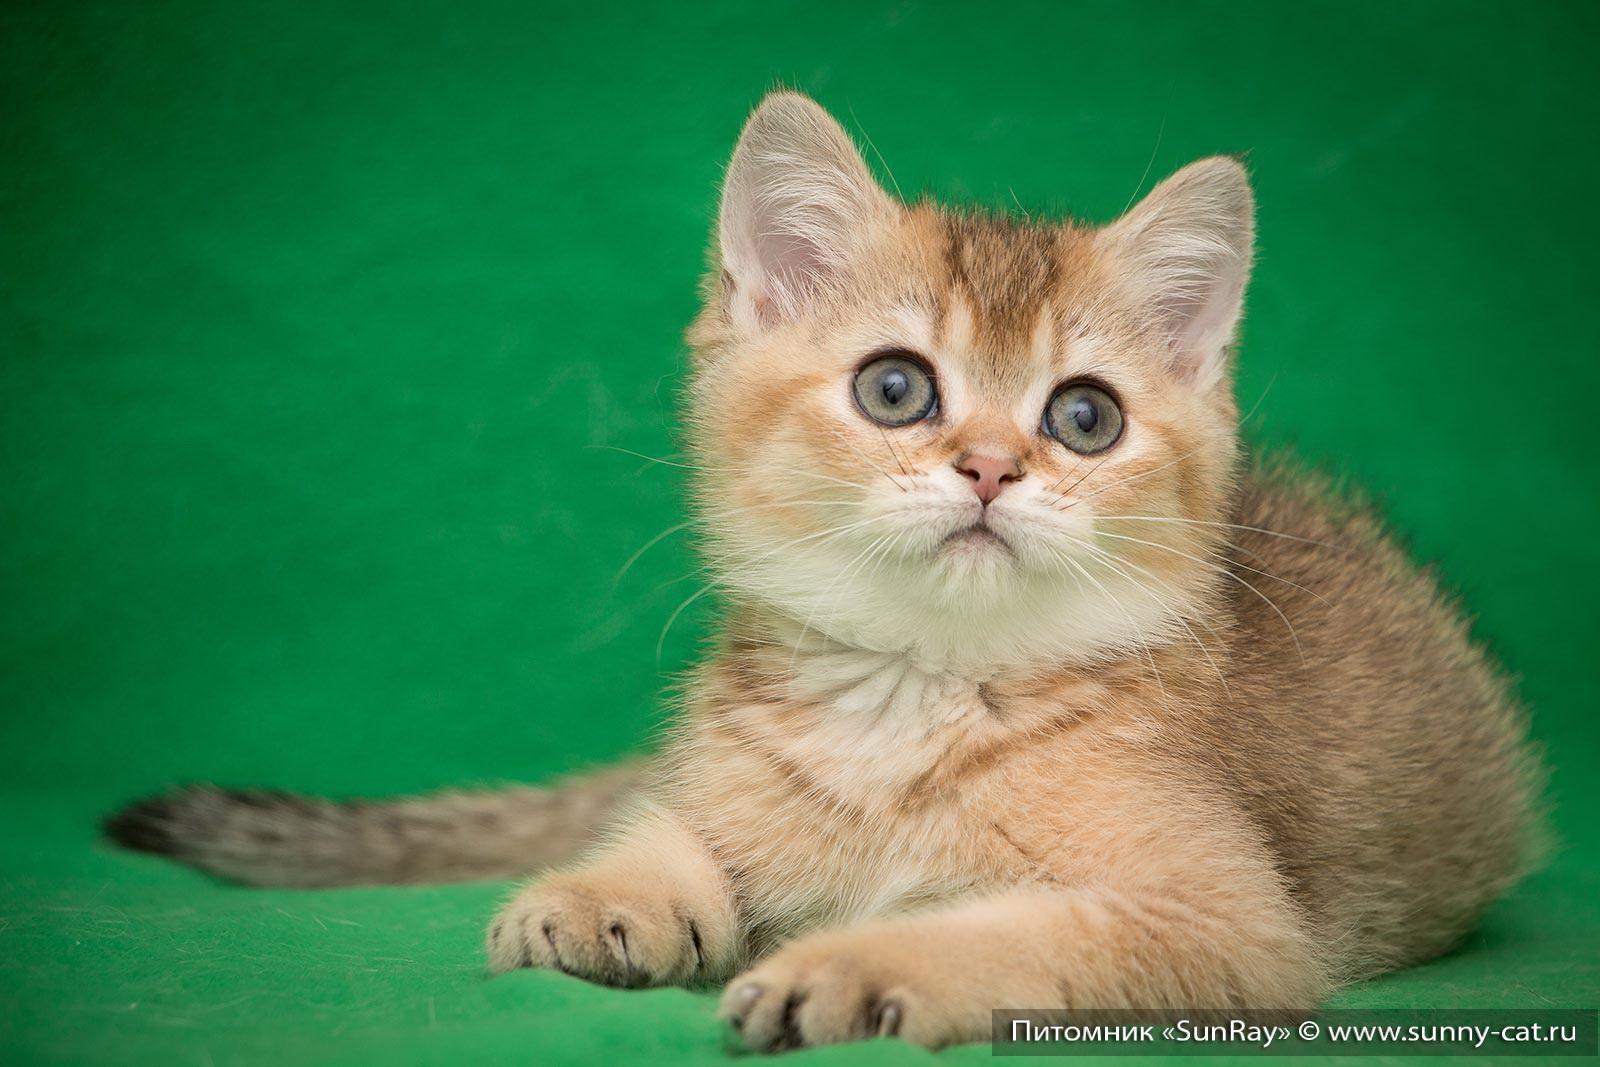 Рыжая cute sunny фото